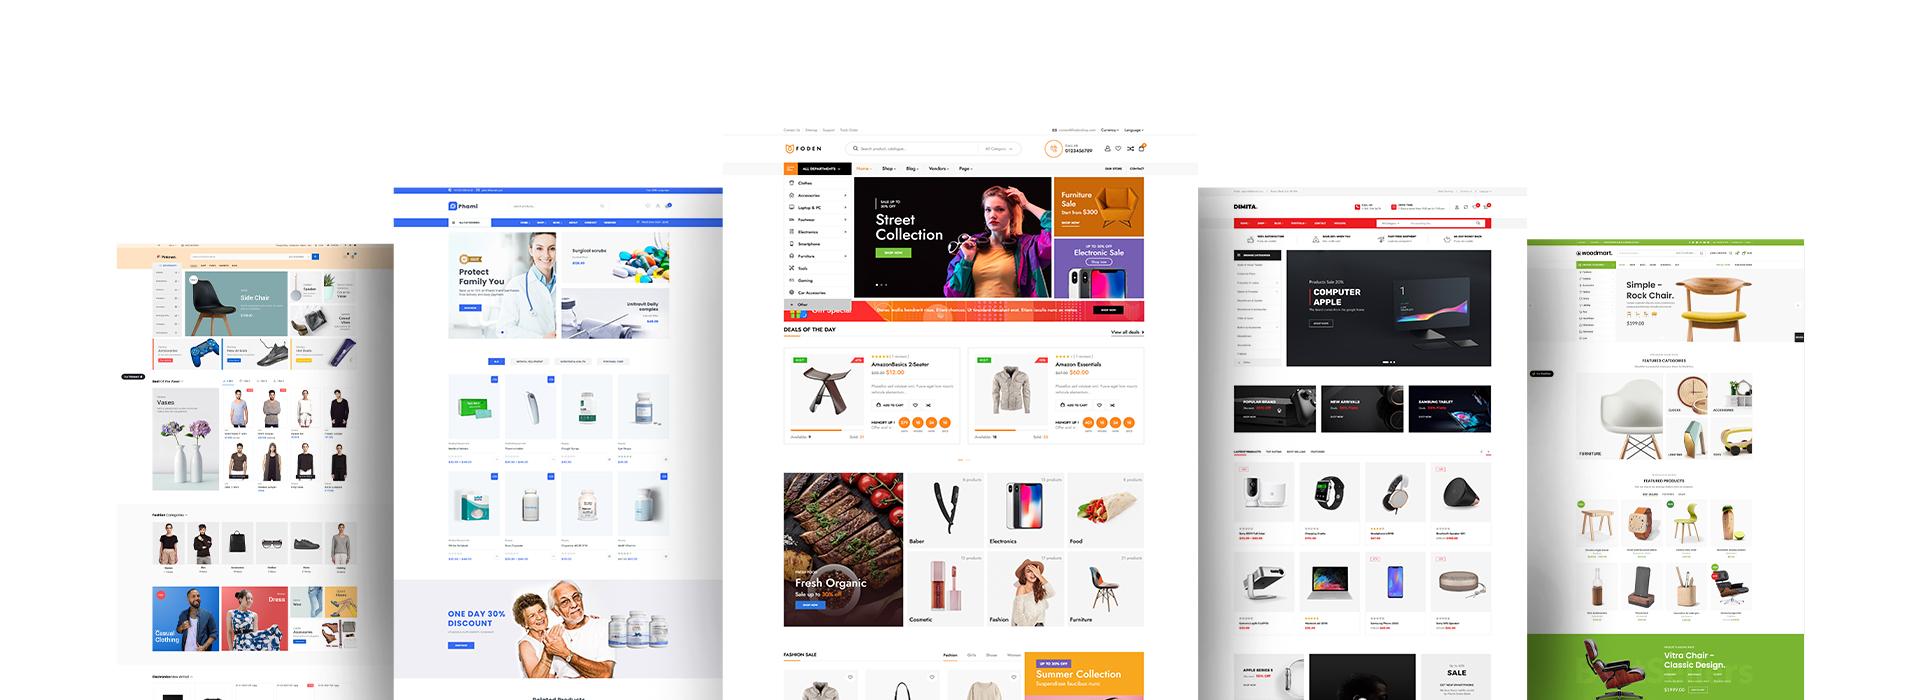 Ecommerce Development Web Pages